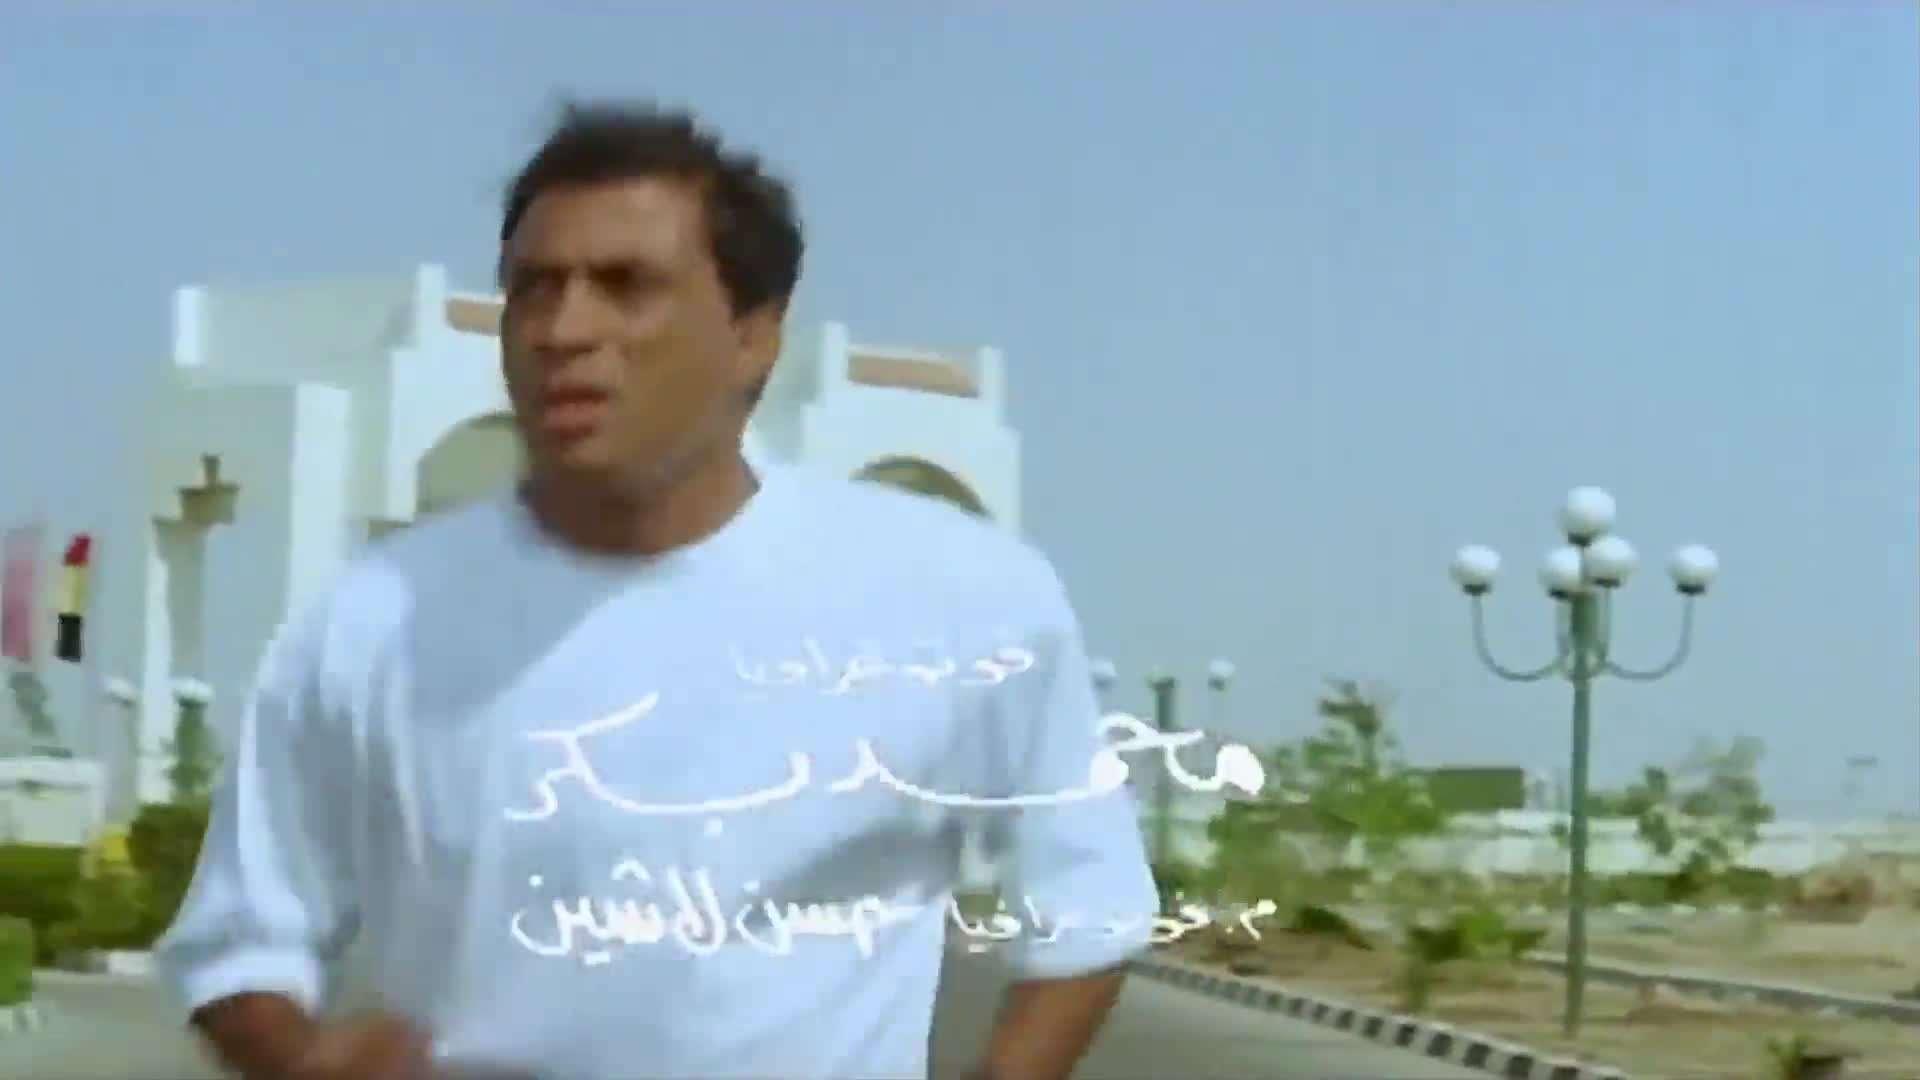 [فيلم][تورنت][تحميل][استاكوزا][1996][1080p][Web-DL] 3 arabp2p.com